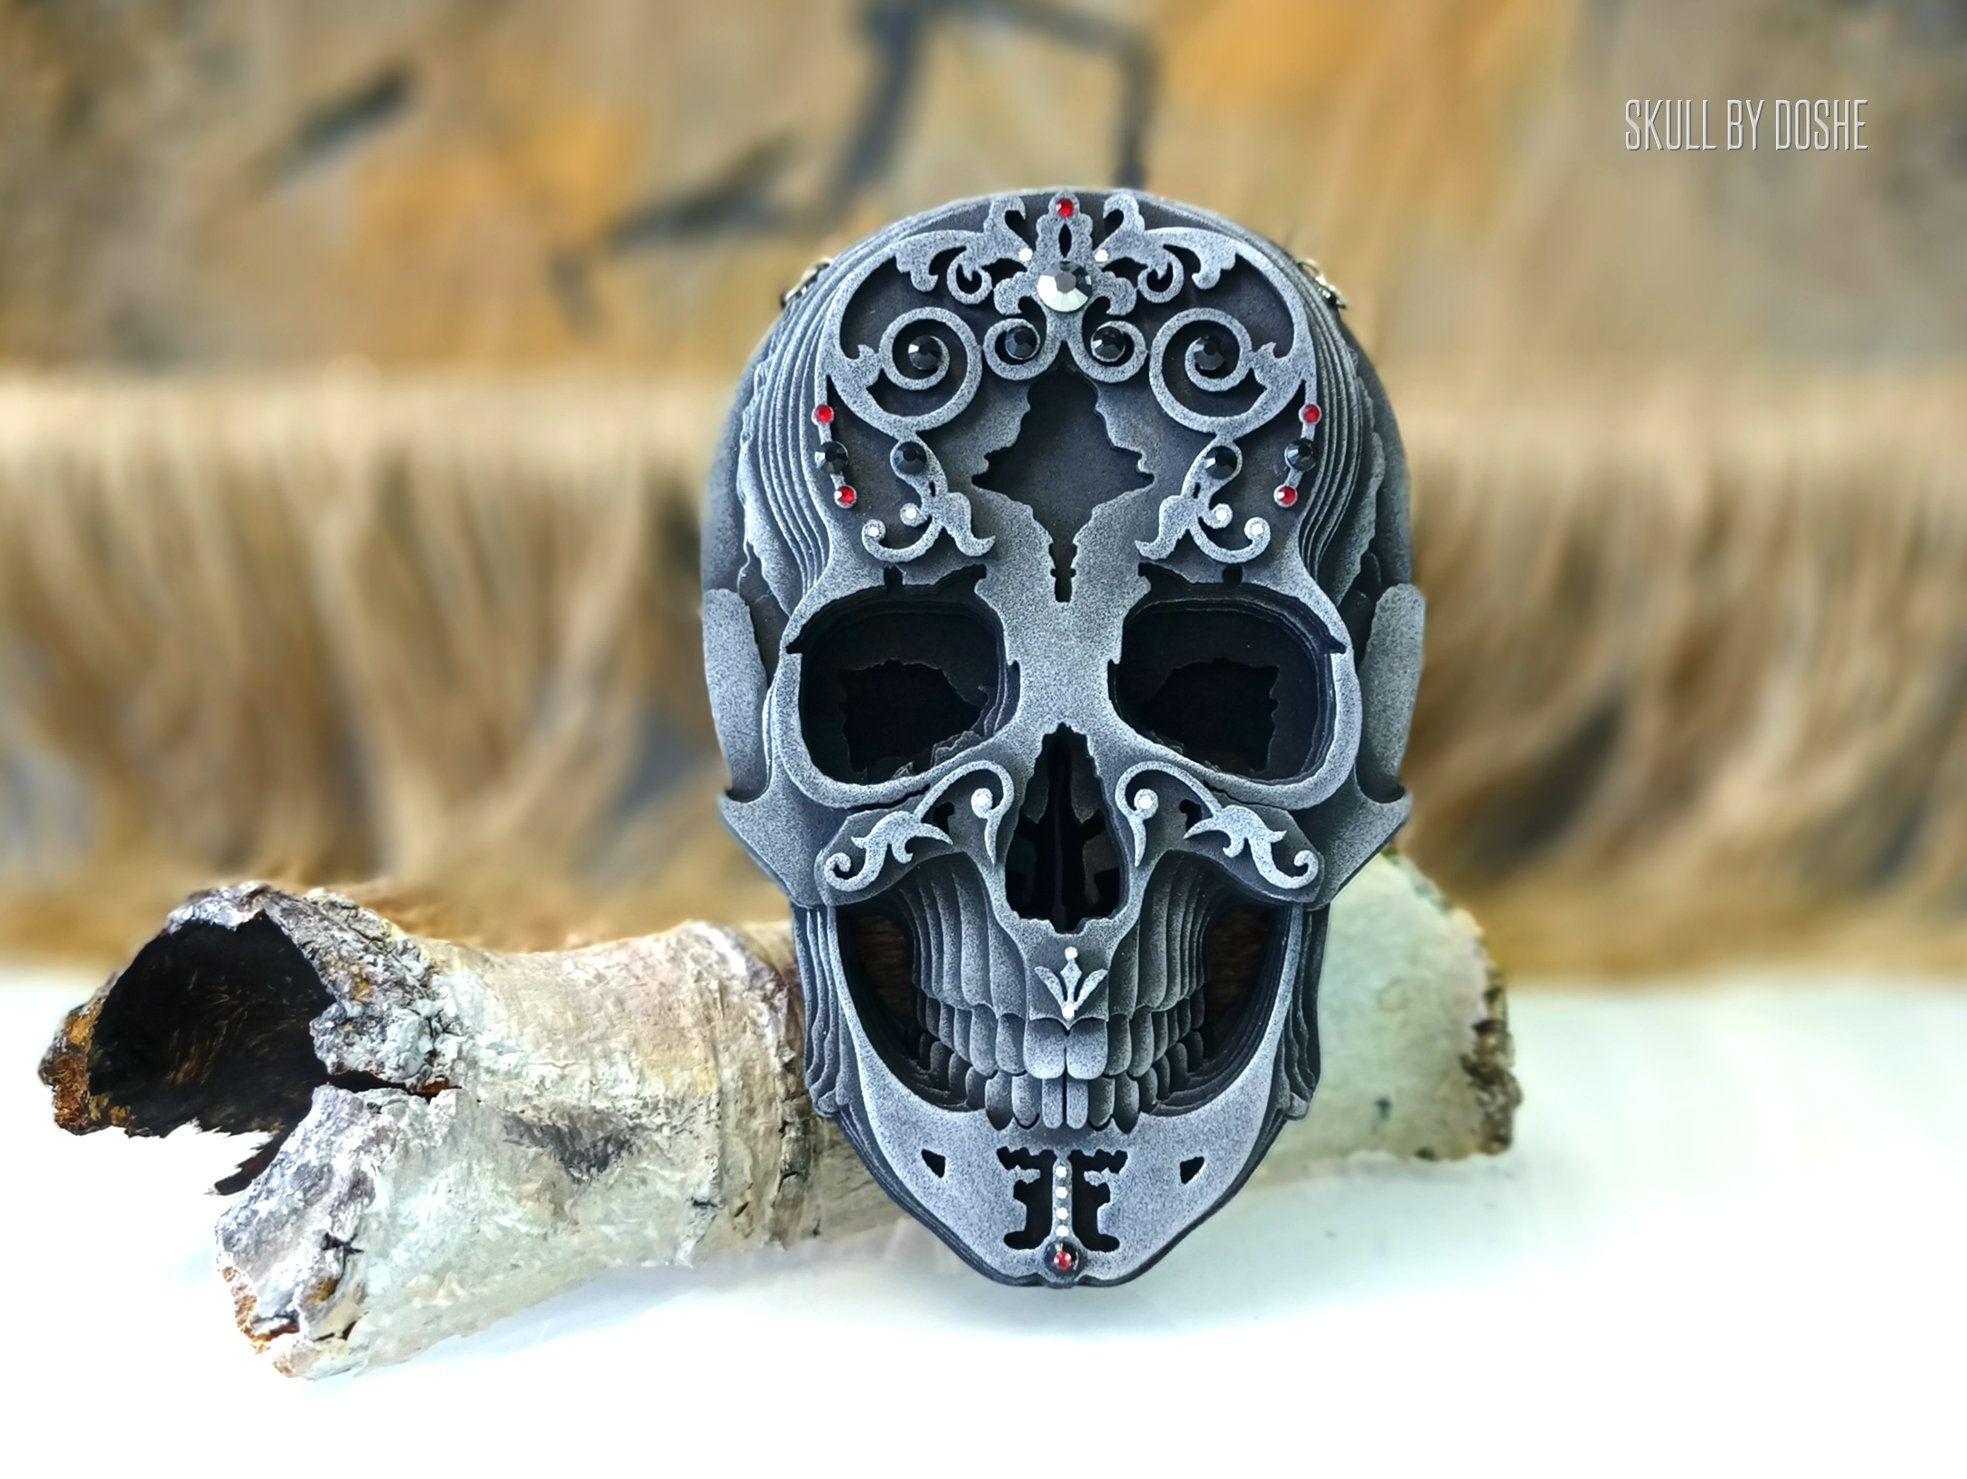 HUMAN SKULL Replica  Halloween gifts  Car mirror charm  | Etsy